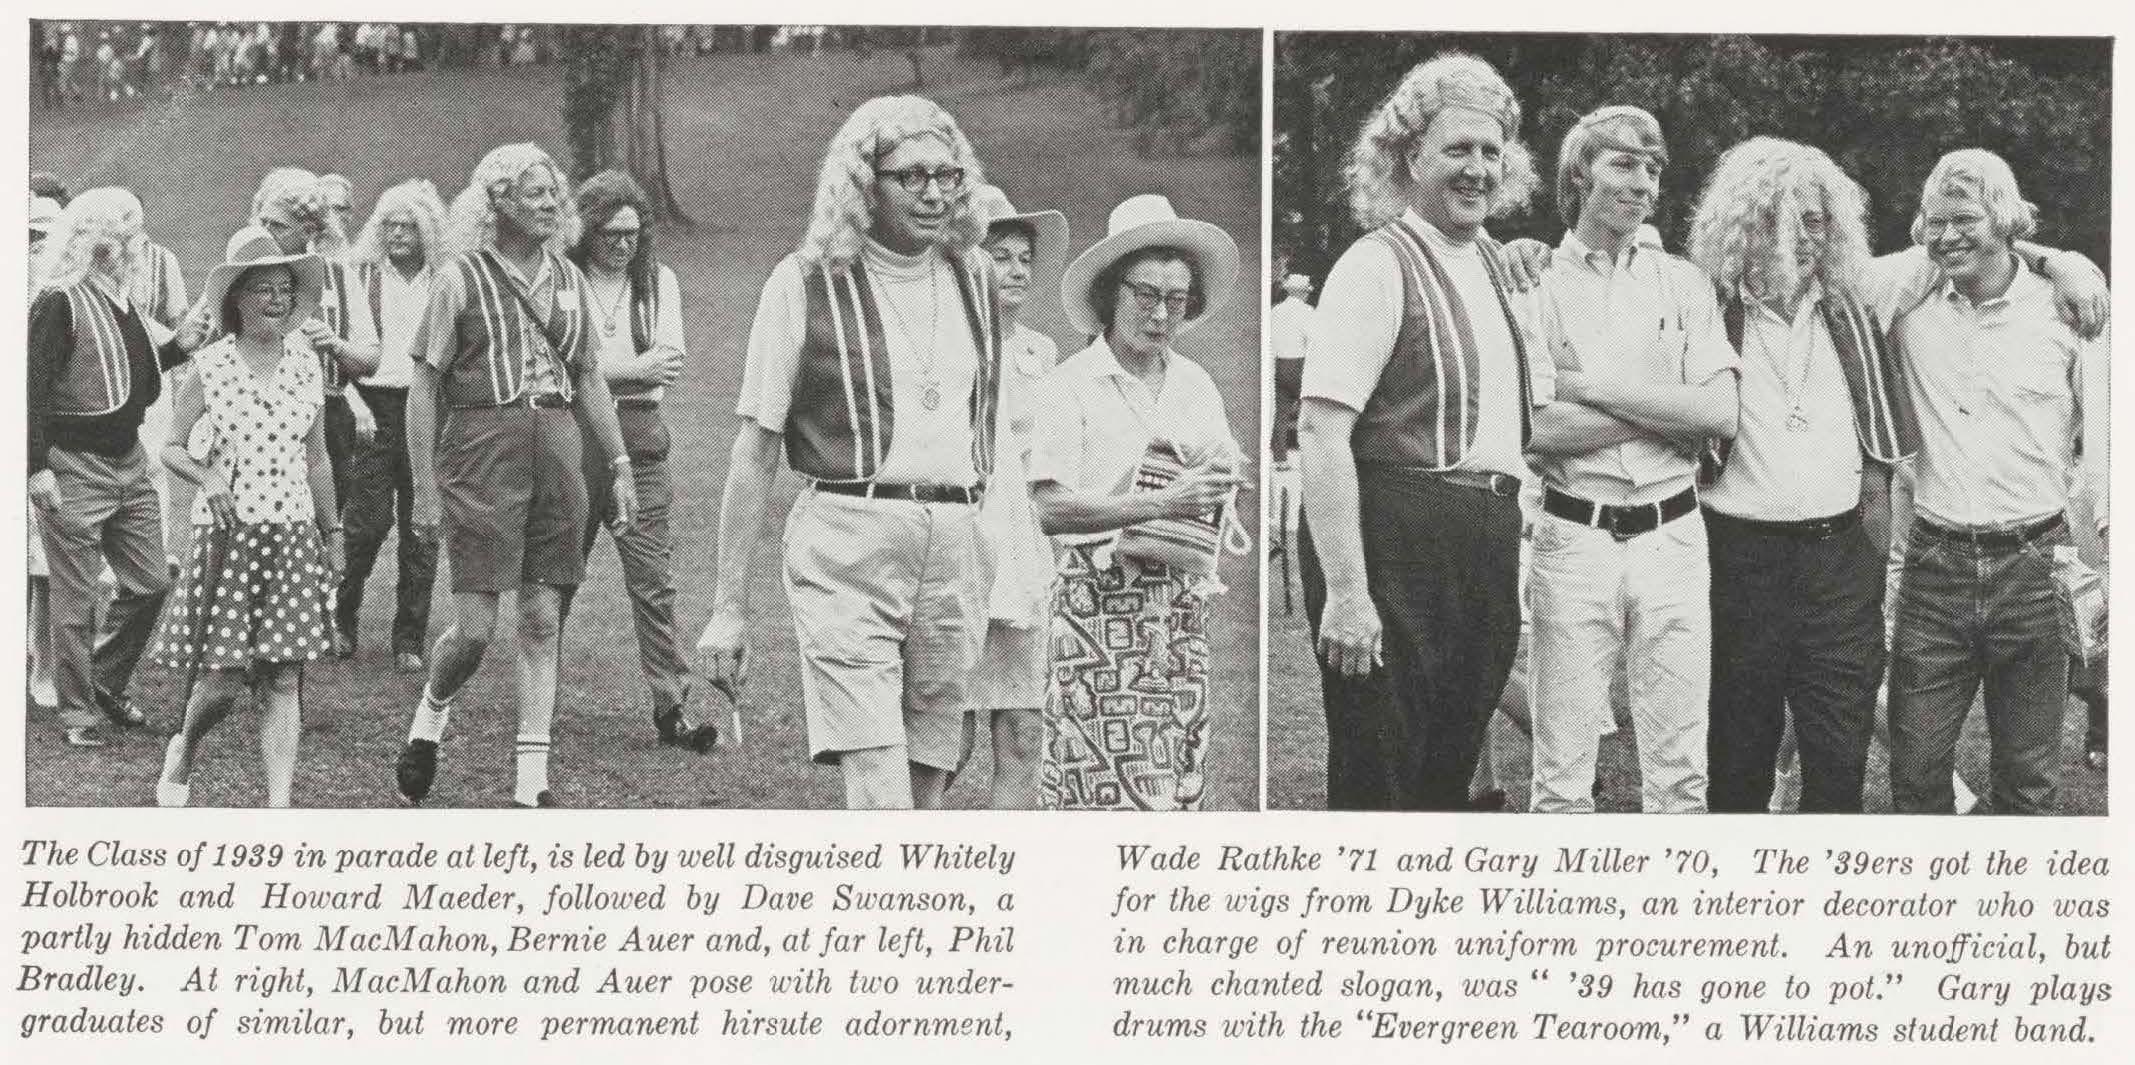 Alumni Review 1969 3 Summer - 1939 reunion costume is hippie wigs